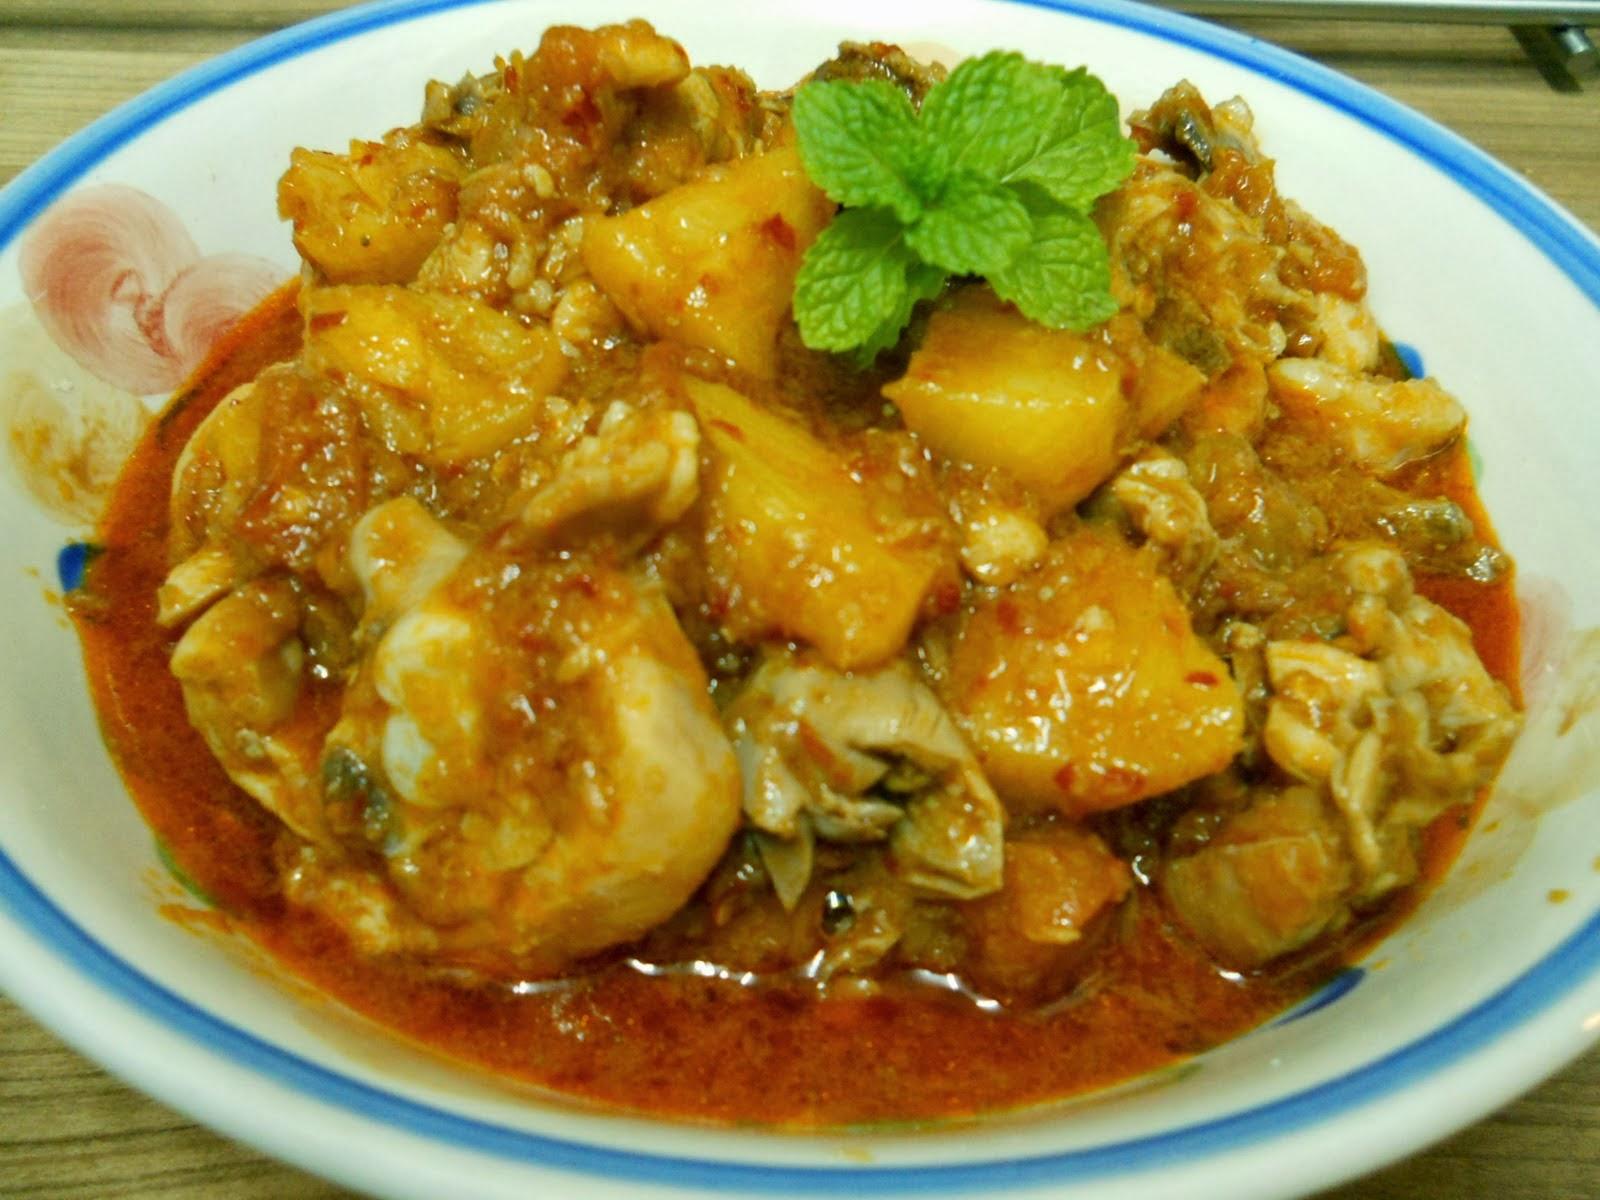 Daftar Resep Masakan Menu Buka Puasa Praktis Lezat